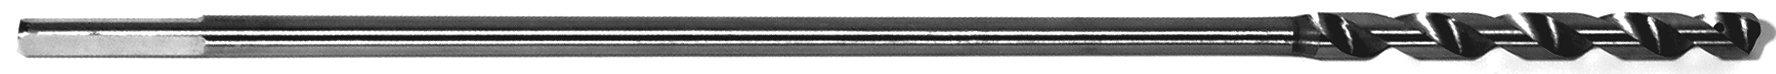 "Century Drill & Tool 33224 Bell Hanger Drill Bit, 3/8"" by 18"""